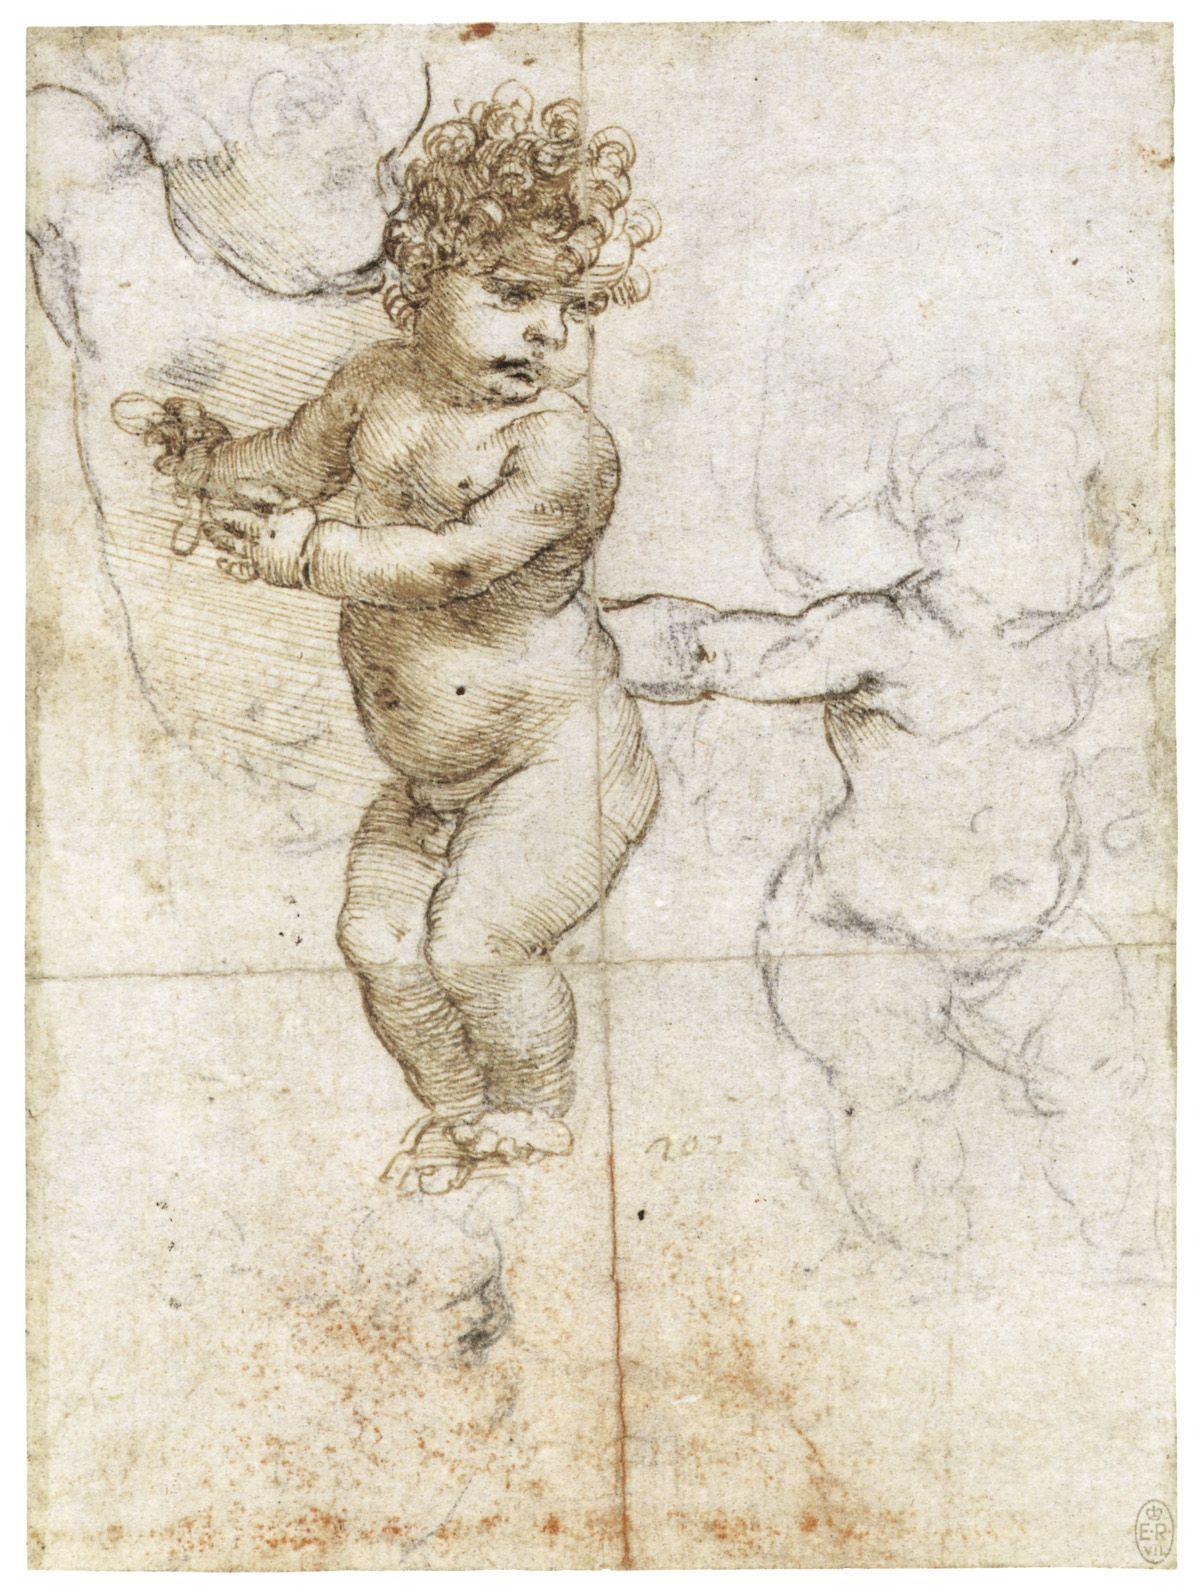 leonardo da vinci sketch of baby historical inspiration leonardo da vinci sketch of baby